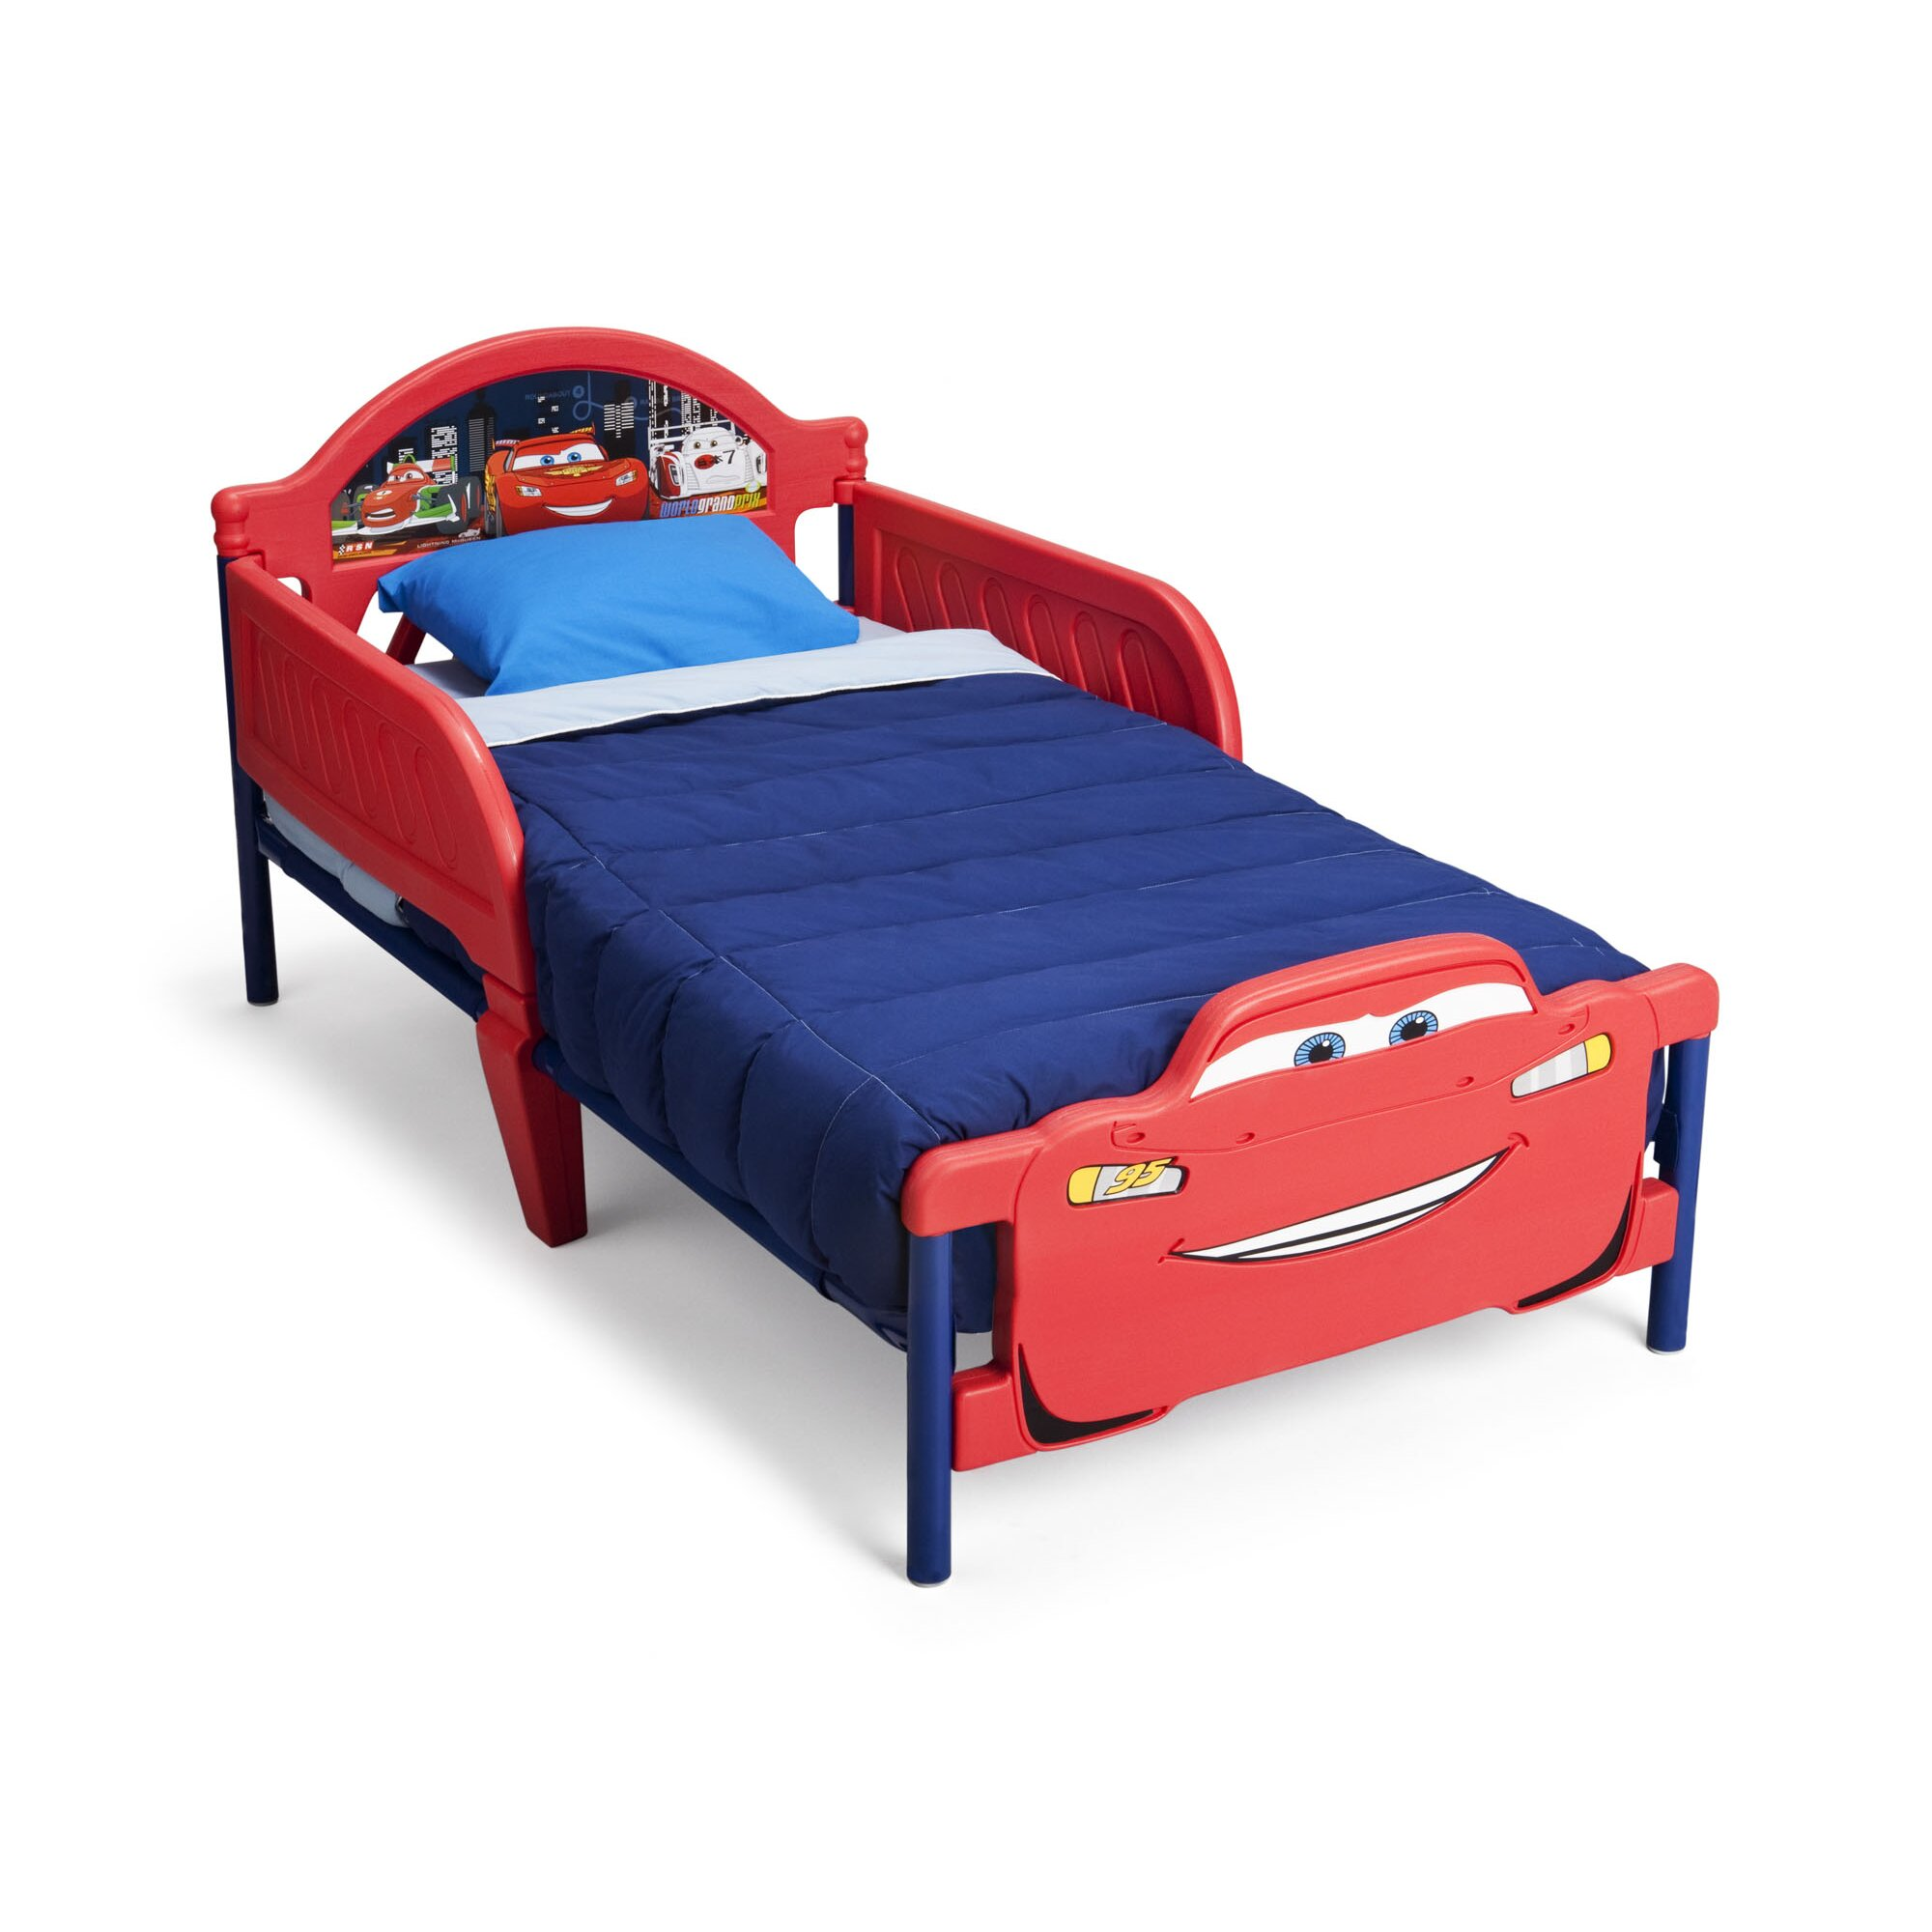 Little tikes lightning mcqueen toddler bed - Disney Cars 3d Convertible Toddler Bed